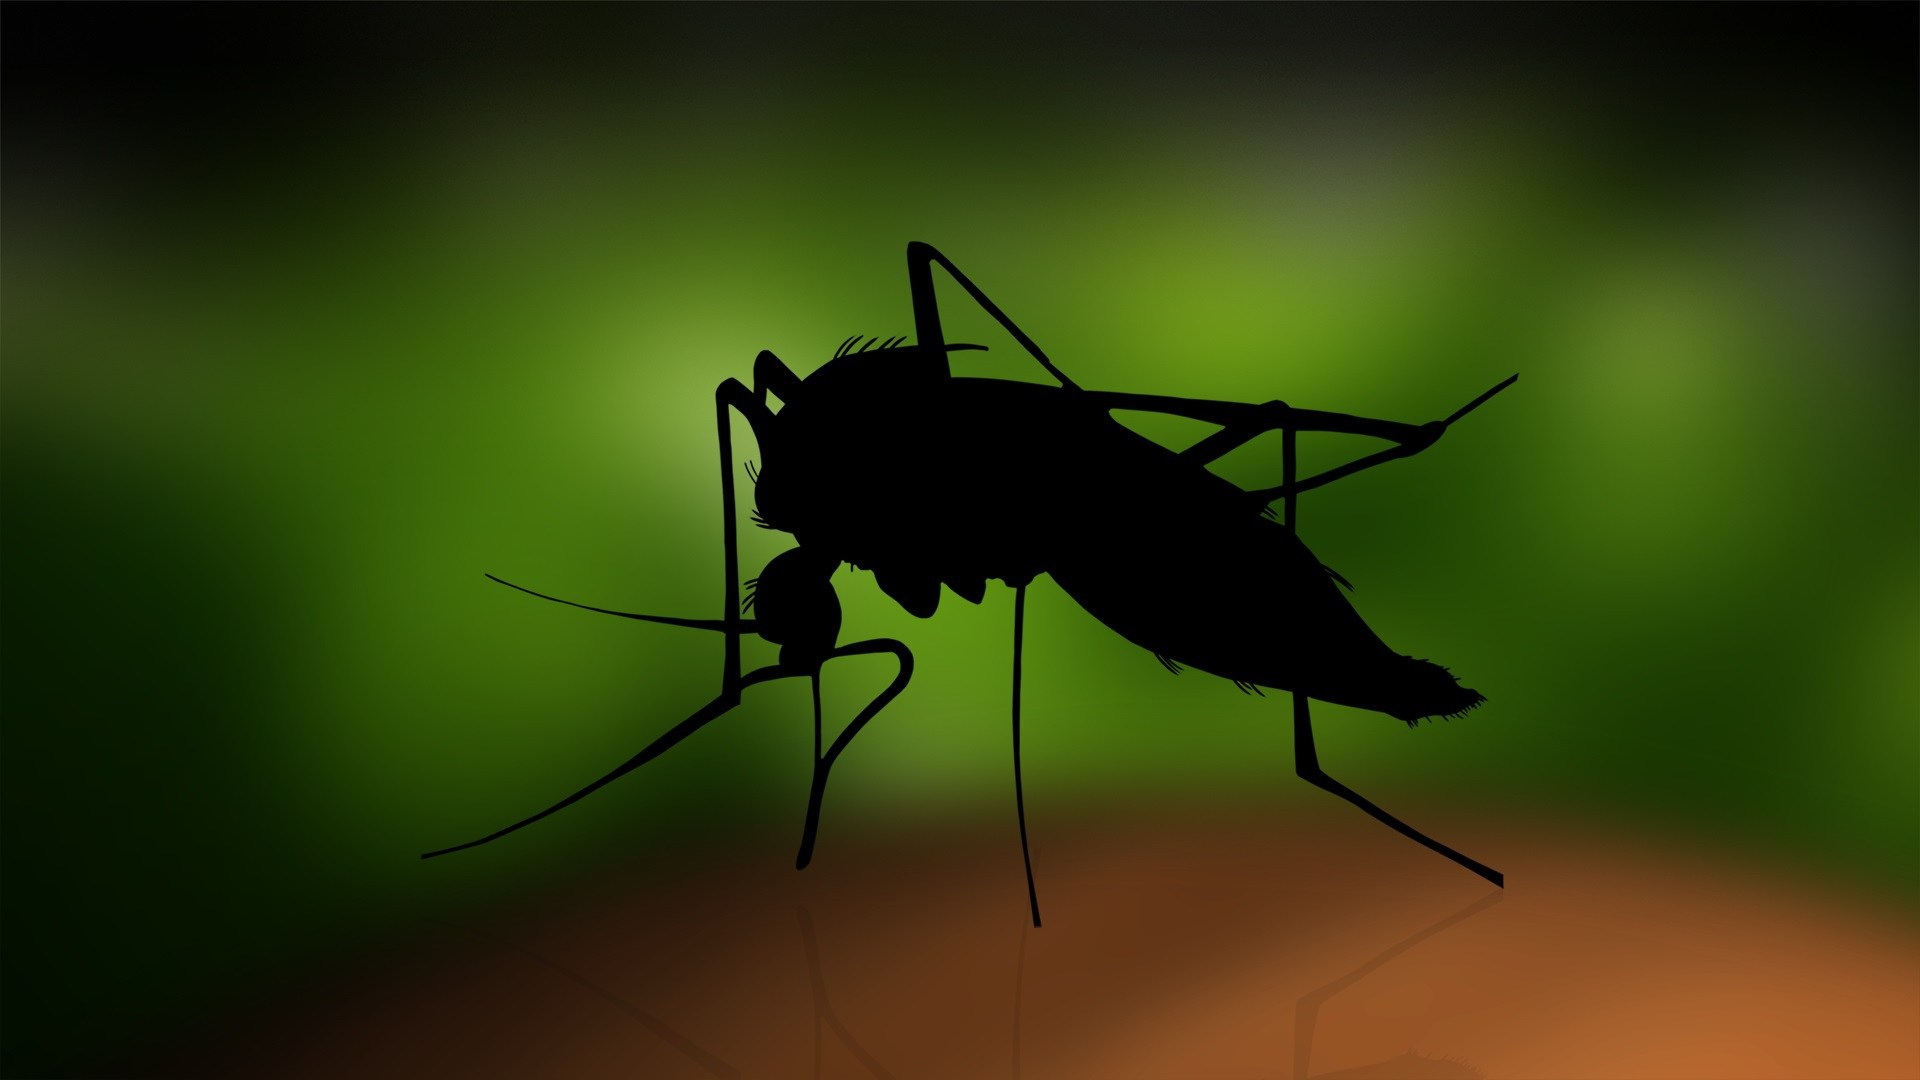 Hd wallpaper virus - Zika Virus Wallpapers Hd